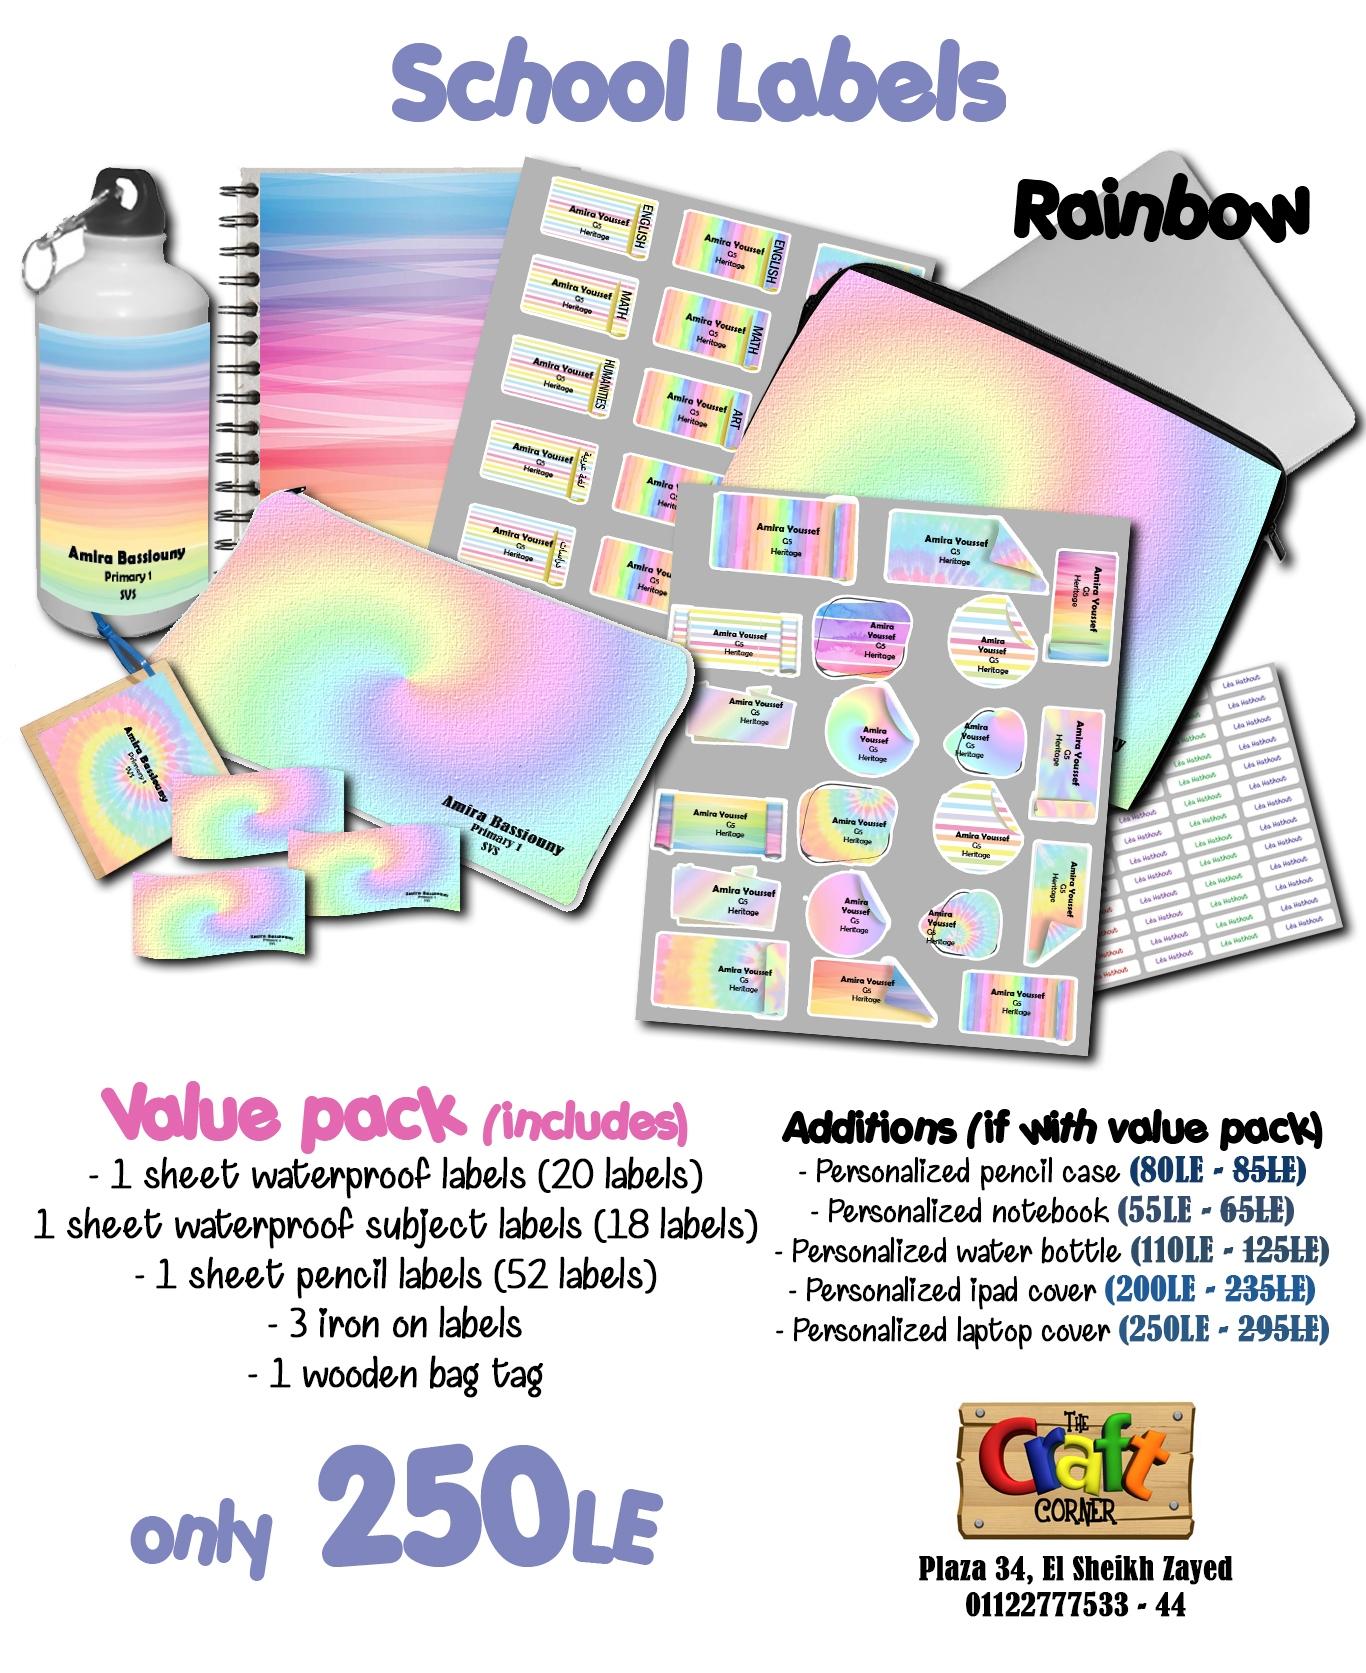 Rainbow ad